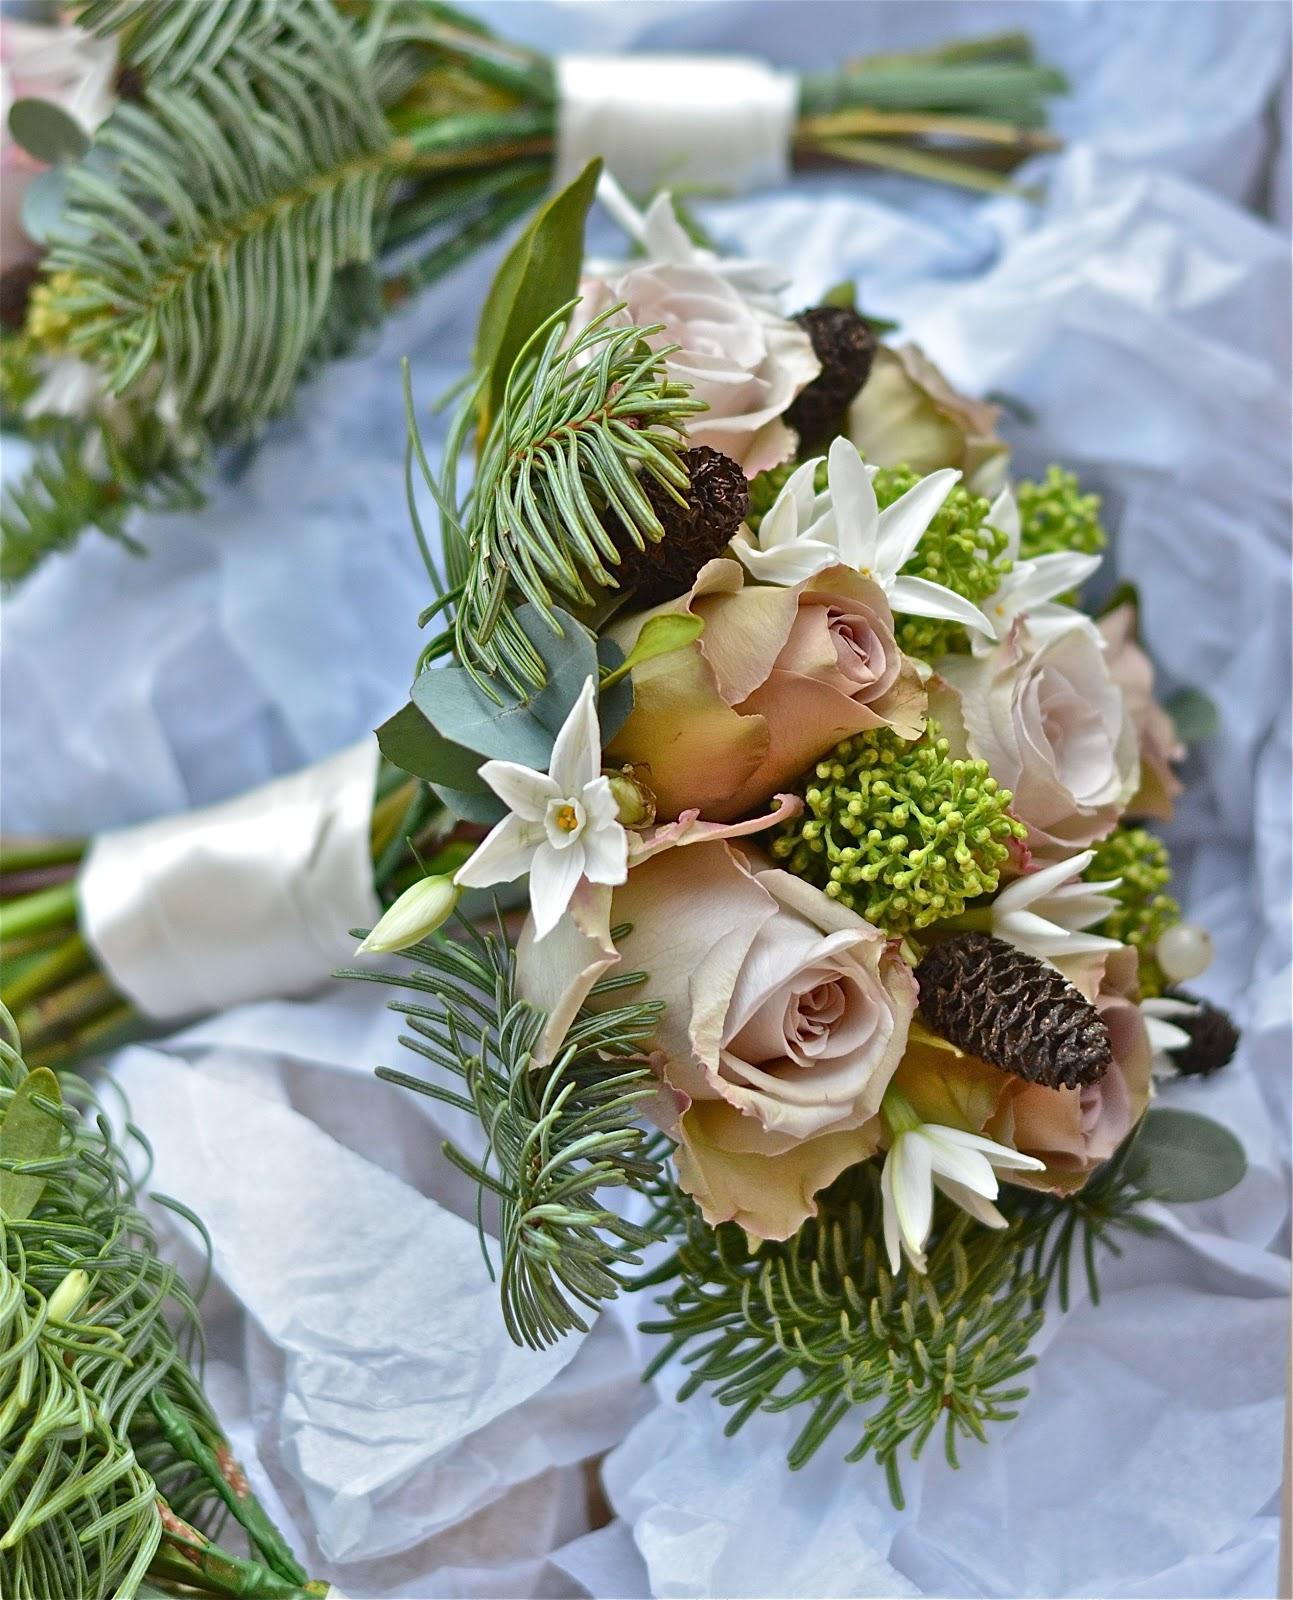 december wedding bouquets photo - 1